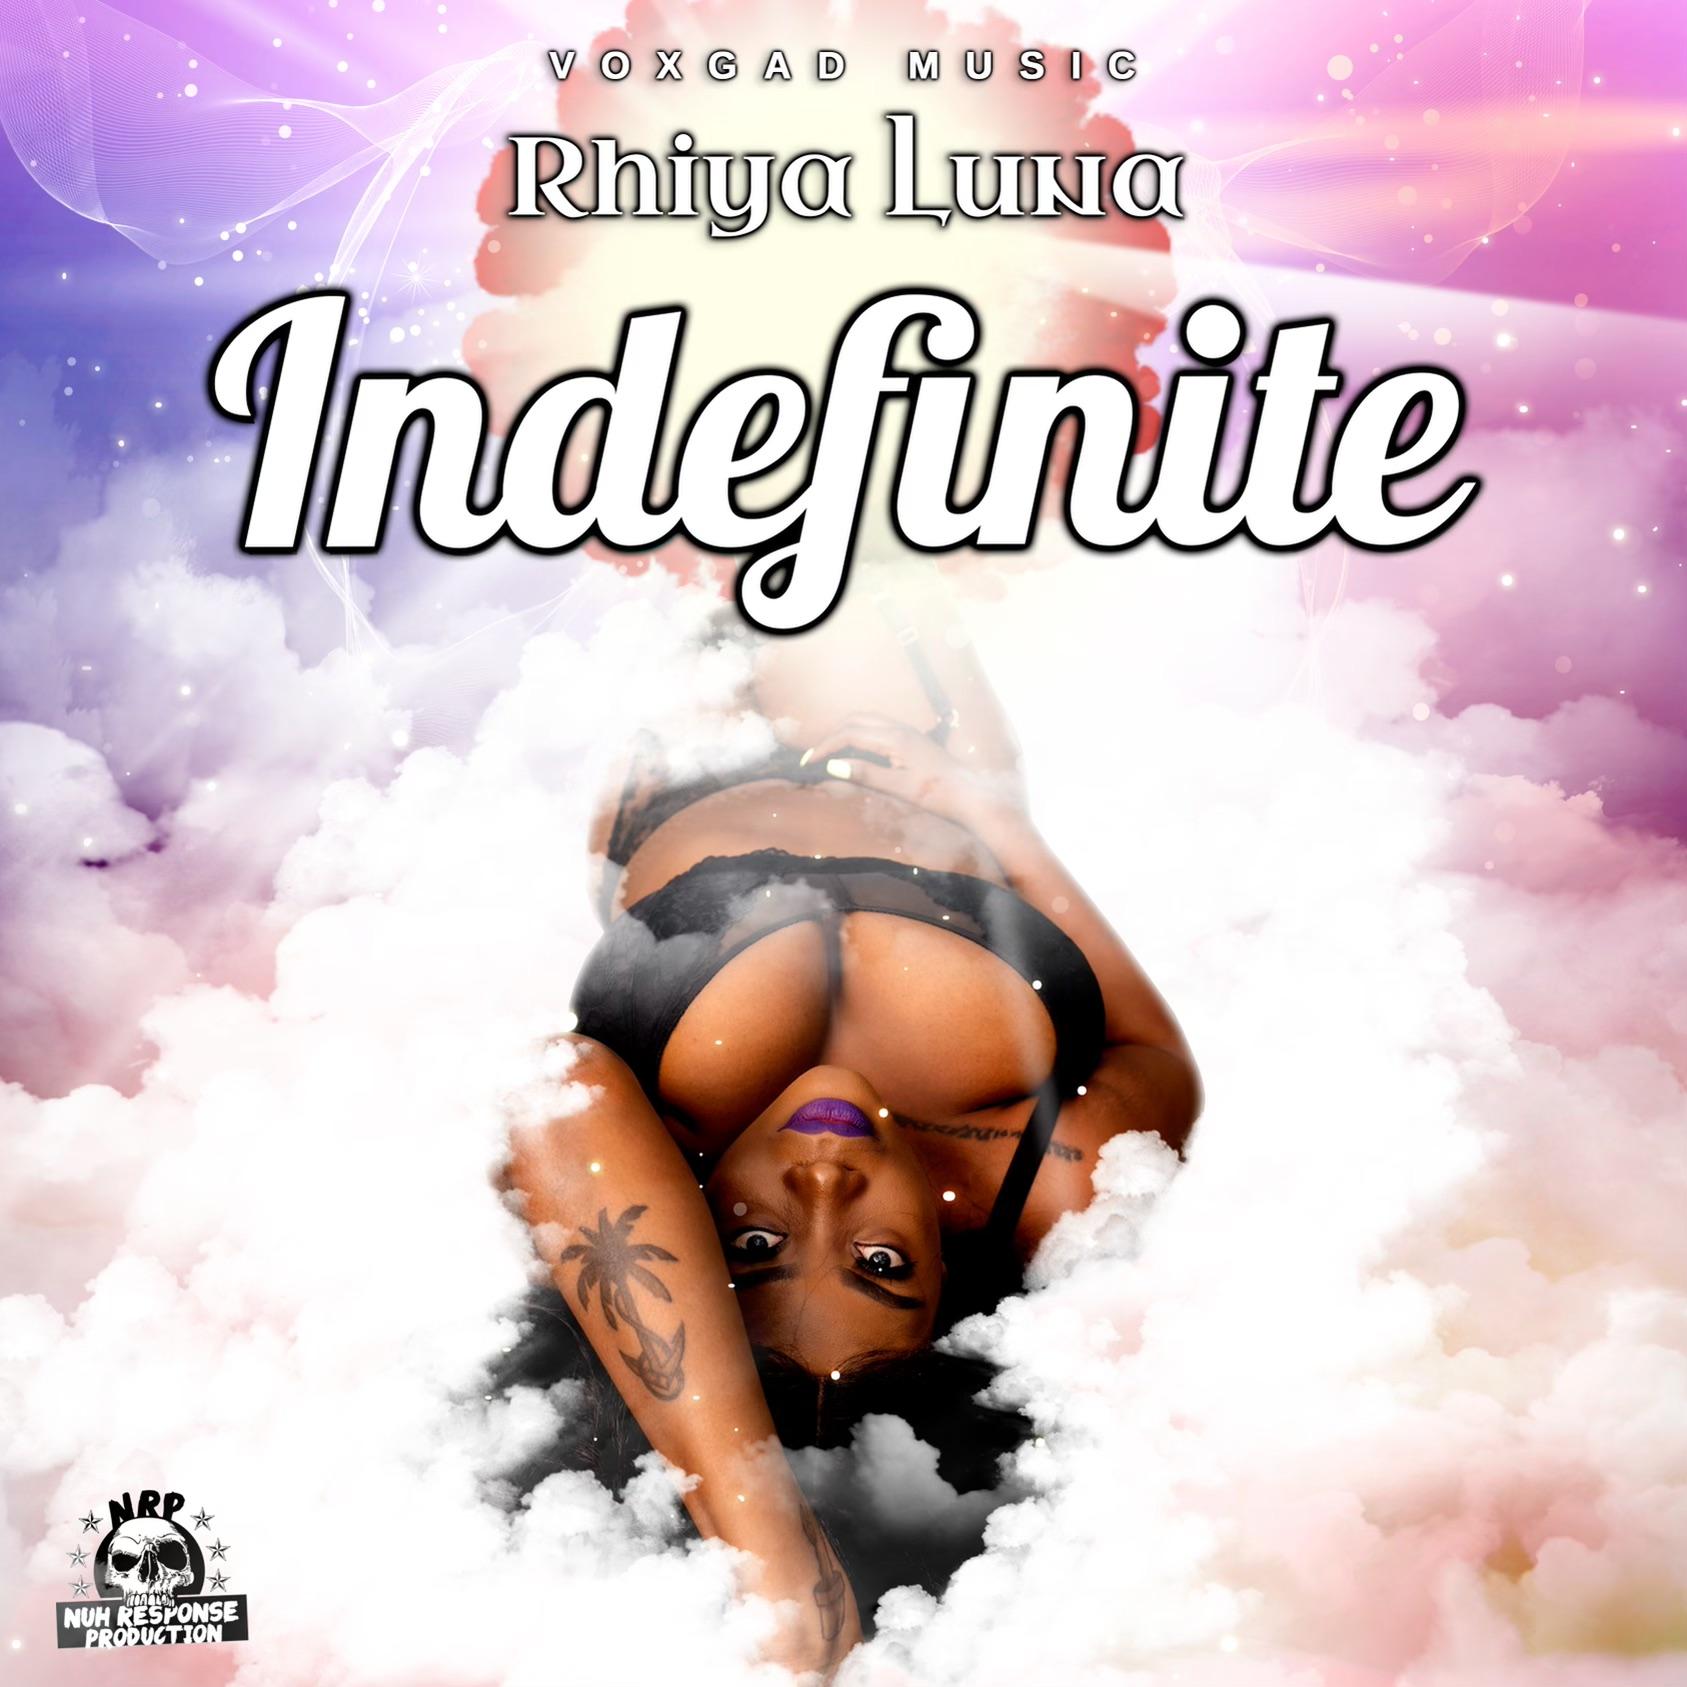 Jamaica Boston Dancehall Music Blog 13thStreetPromotions 13thStreetPromo Indefinite Relationships VoxGad Music Singer Caribbean